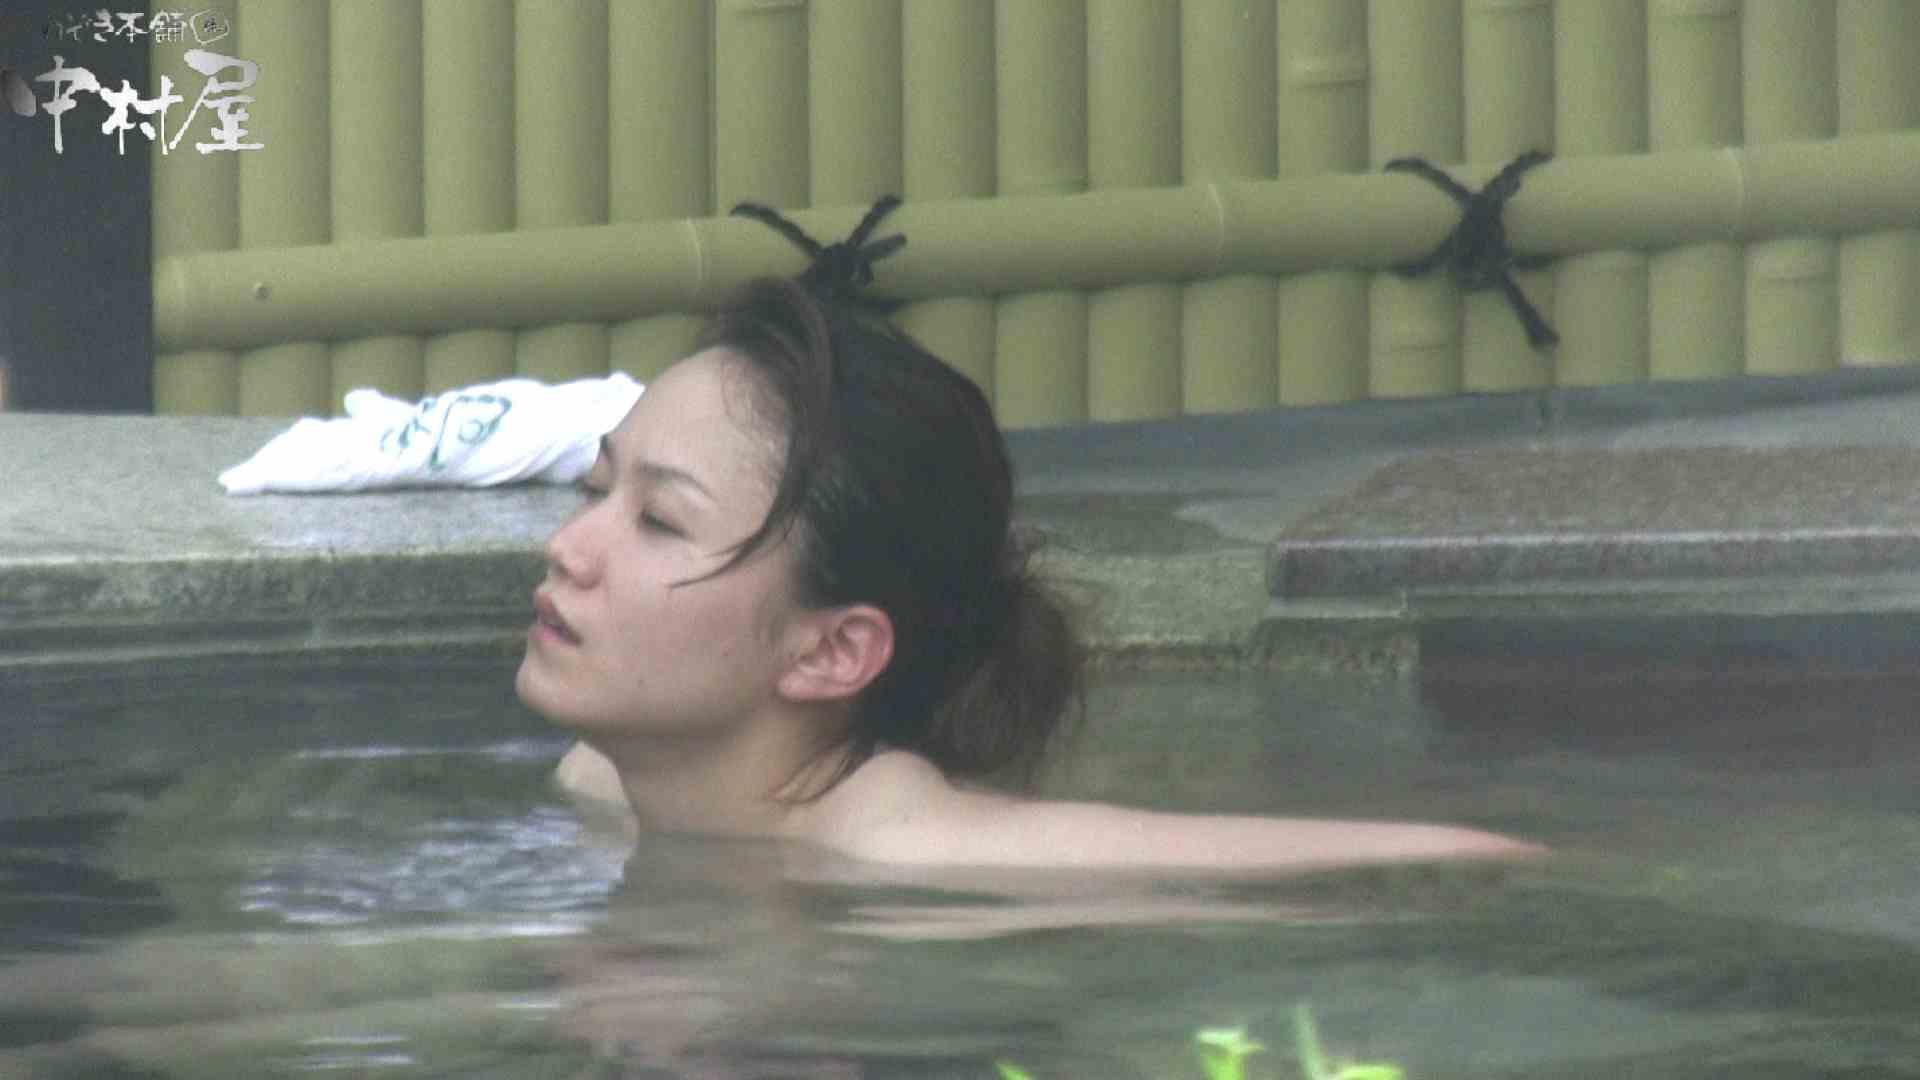 Aquaな露天風呂Vol.901 露天風呂編  110PIX 16